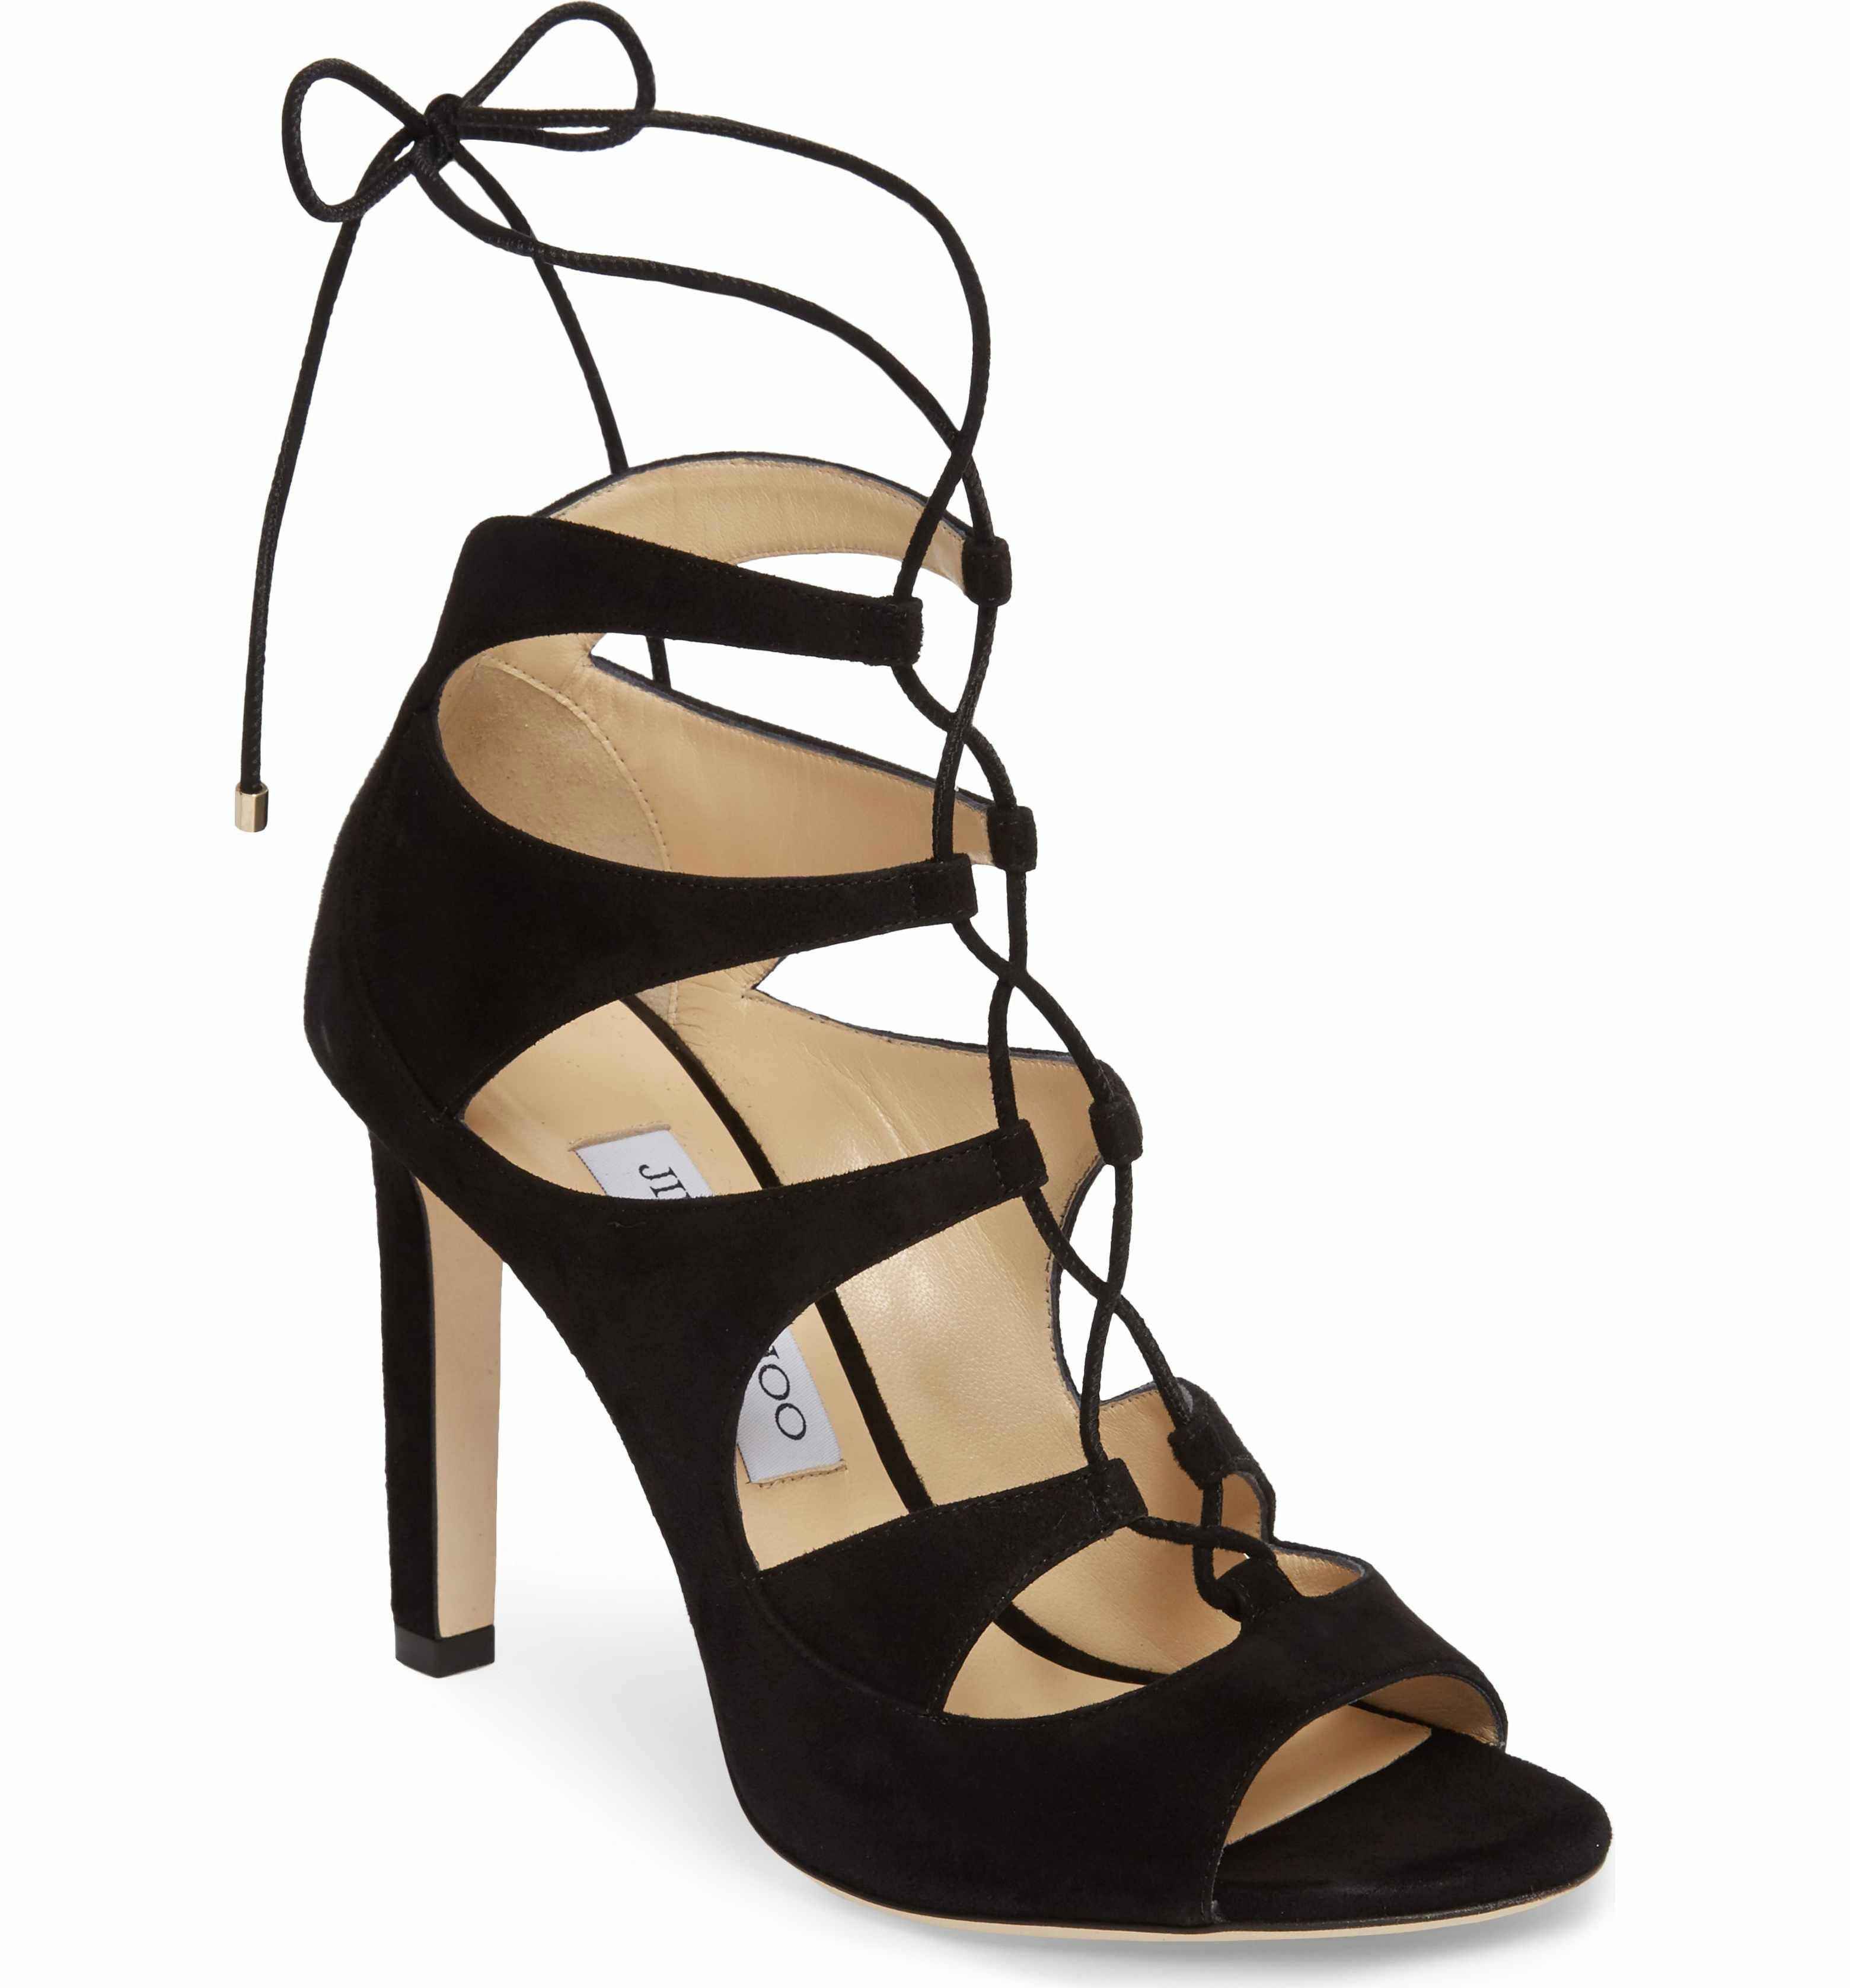 38687cd3e8 Main Image - Jimmy Choo Blake Lace-Up Sandal (Women) #JimmyChoo ...